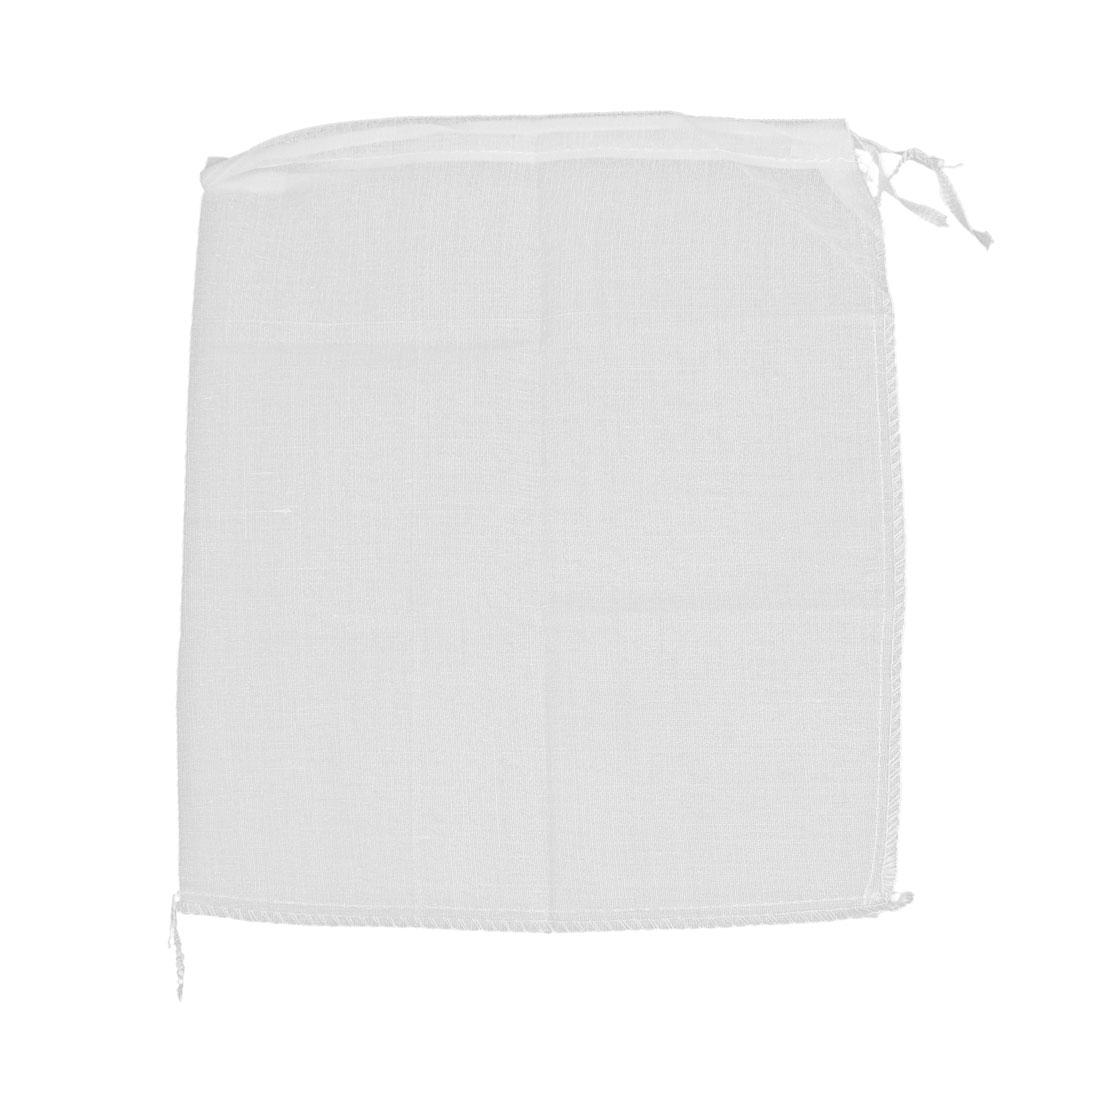 235mm x 275mm Soup Ingredients Filtration Filter Reusable Mesh Bag White 3 Pcs